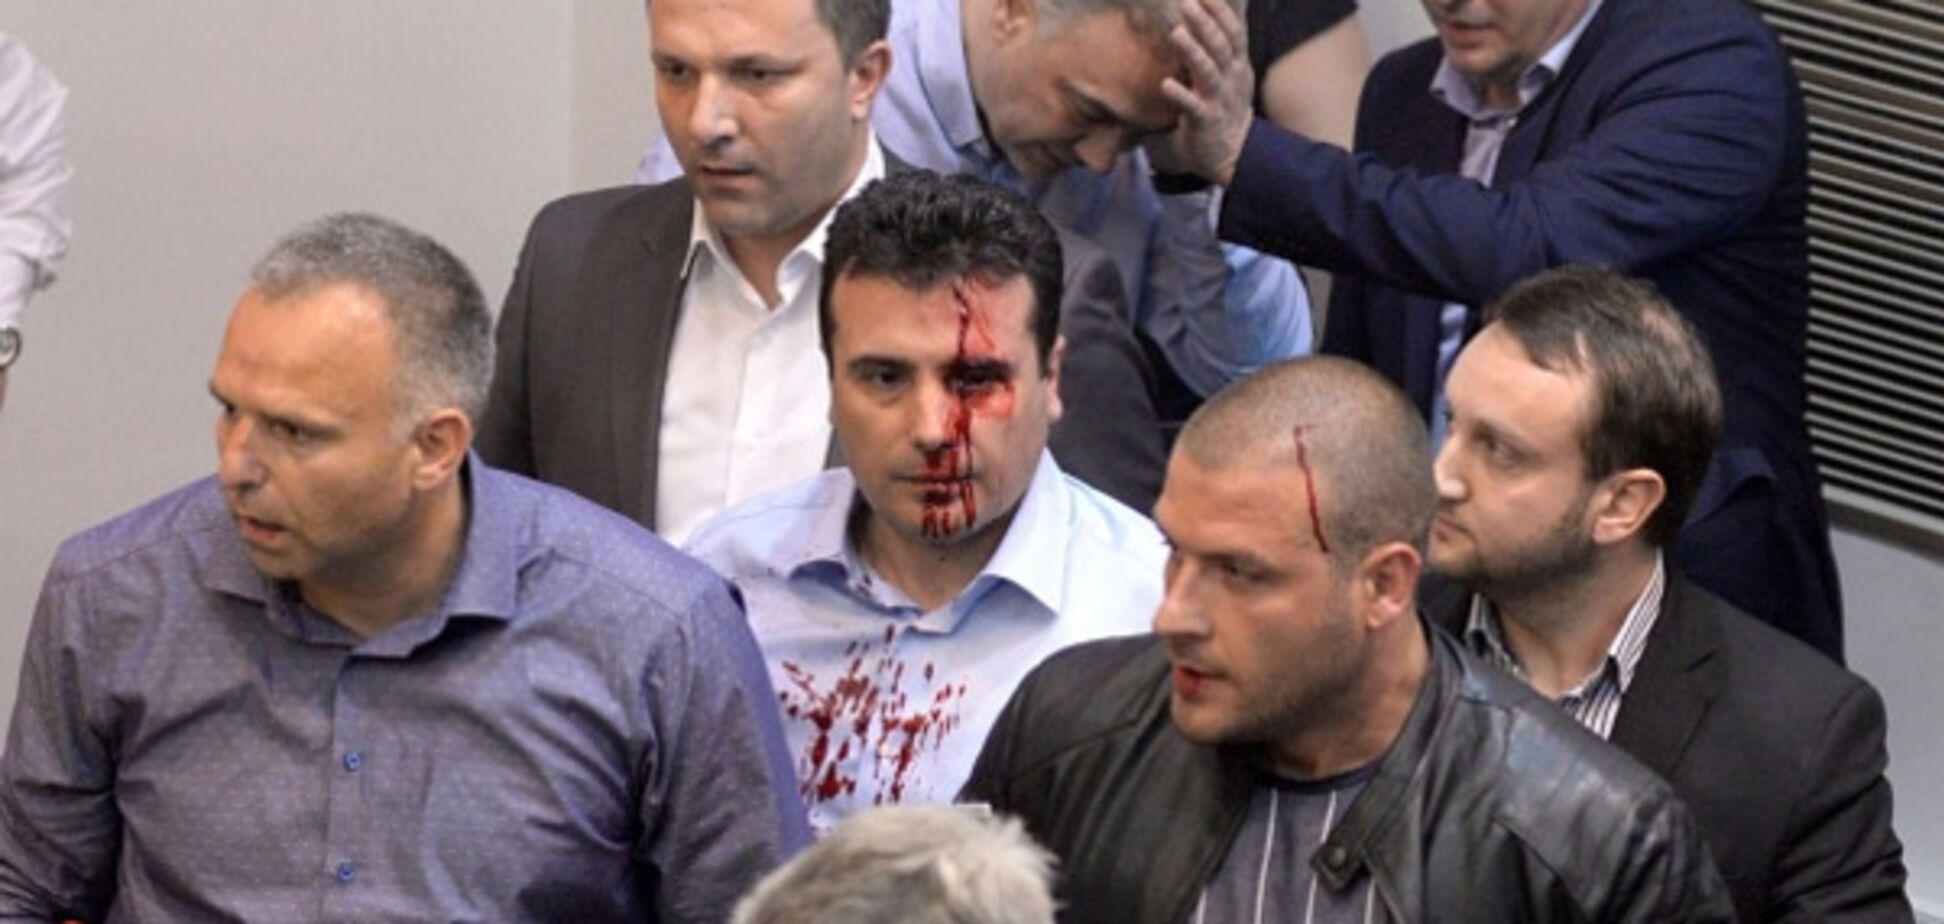 Штурм парламенту Македонії